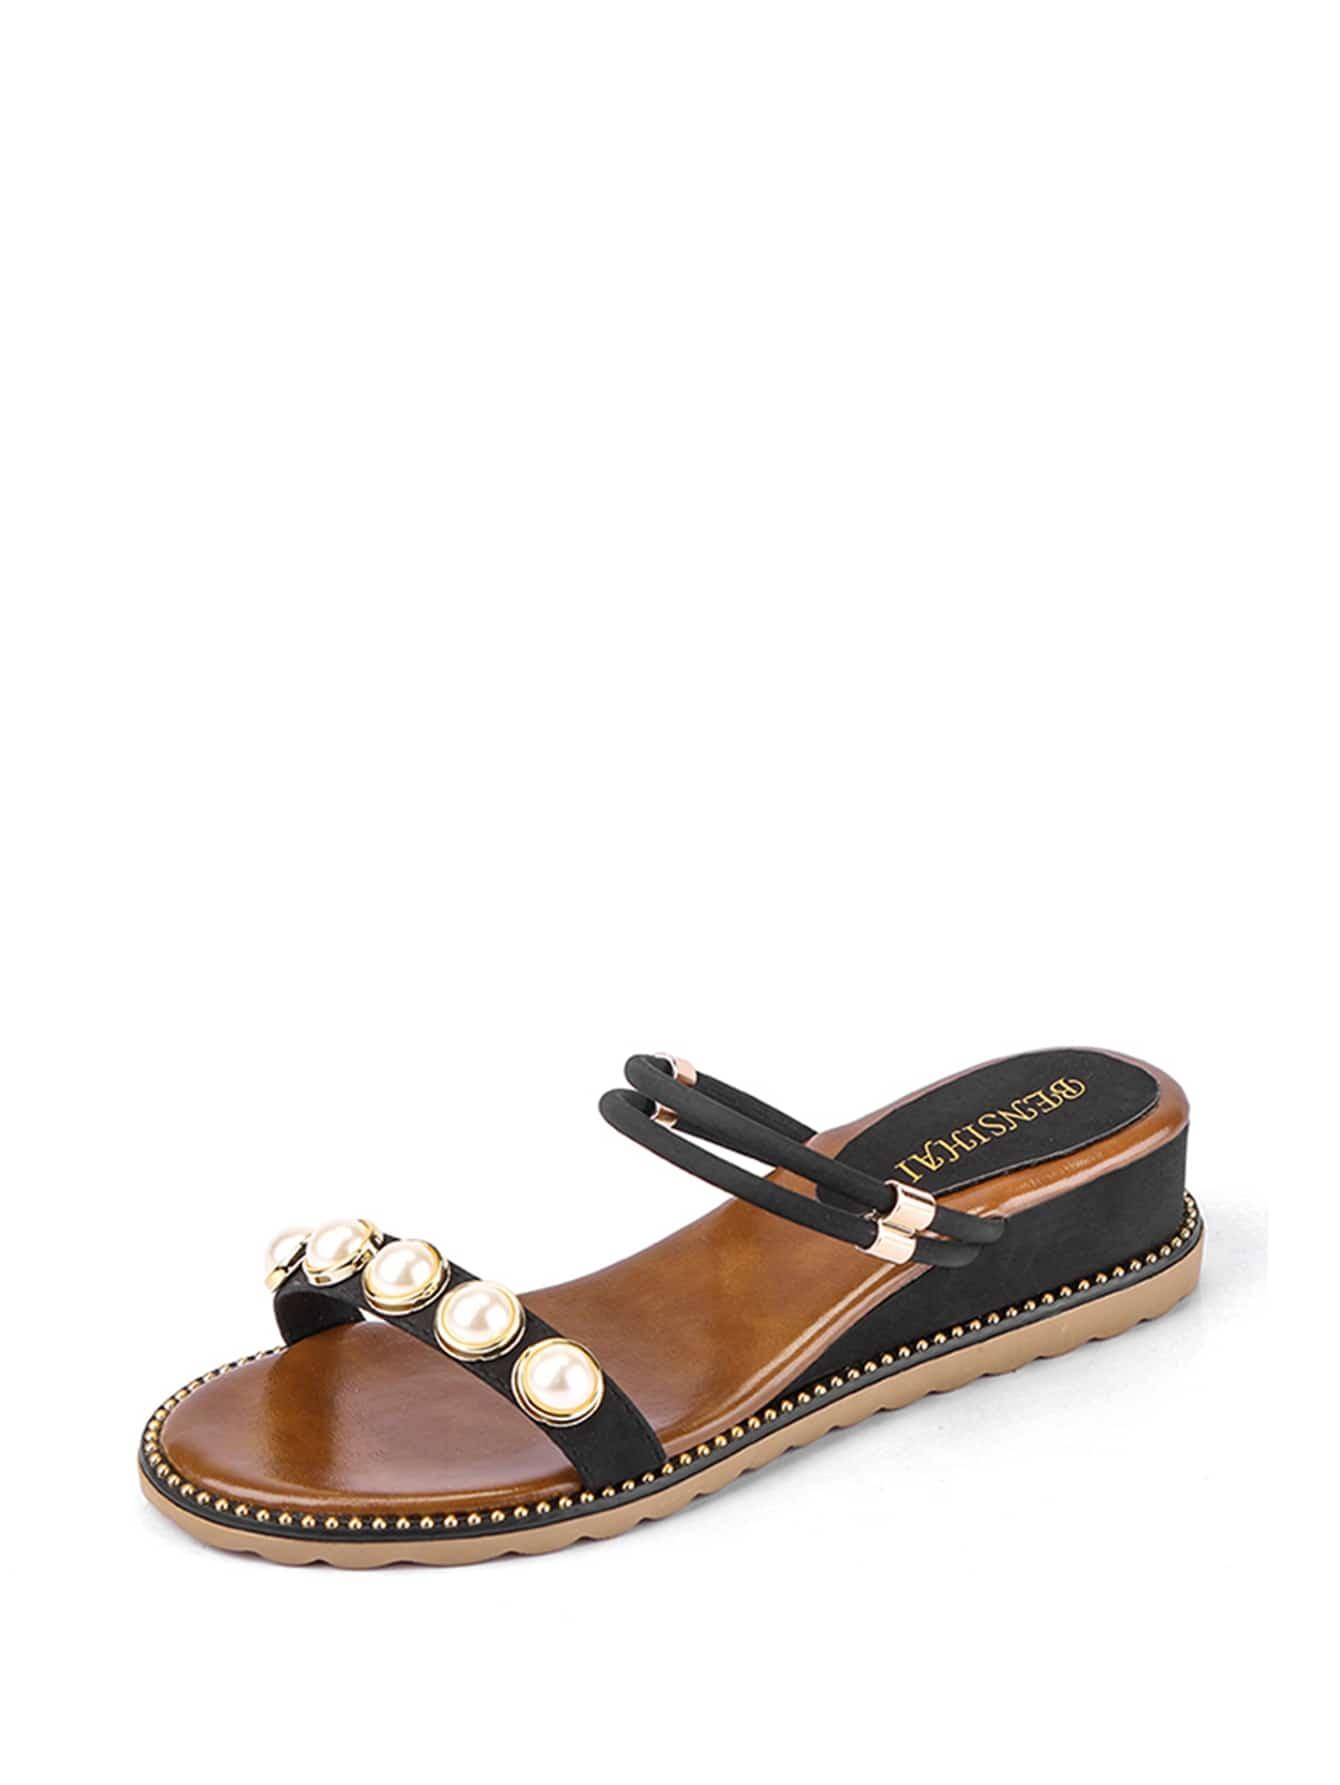 Faux Pearl Convertible Strap Sandals